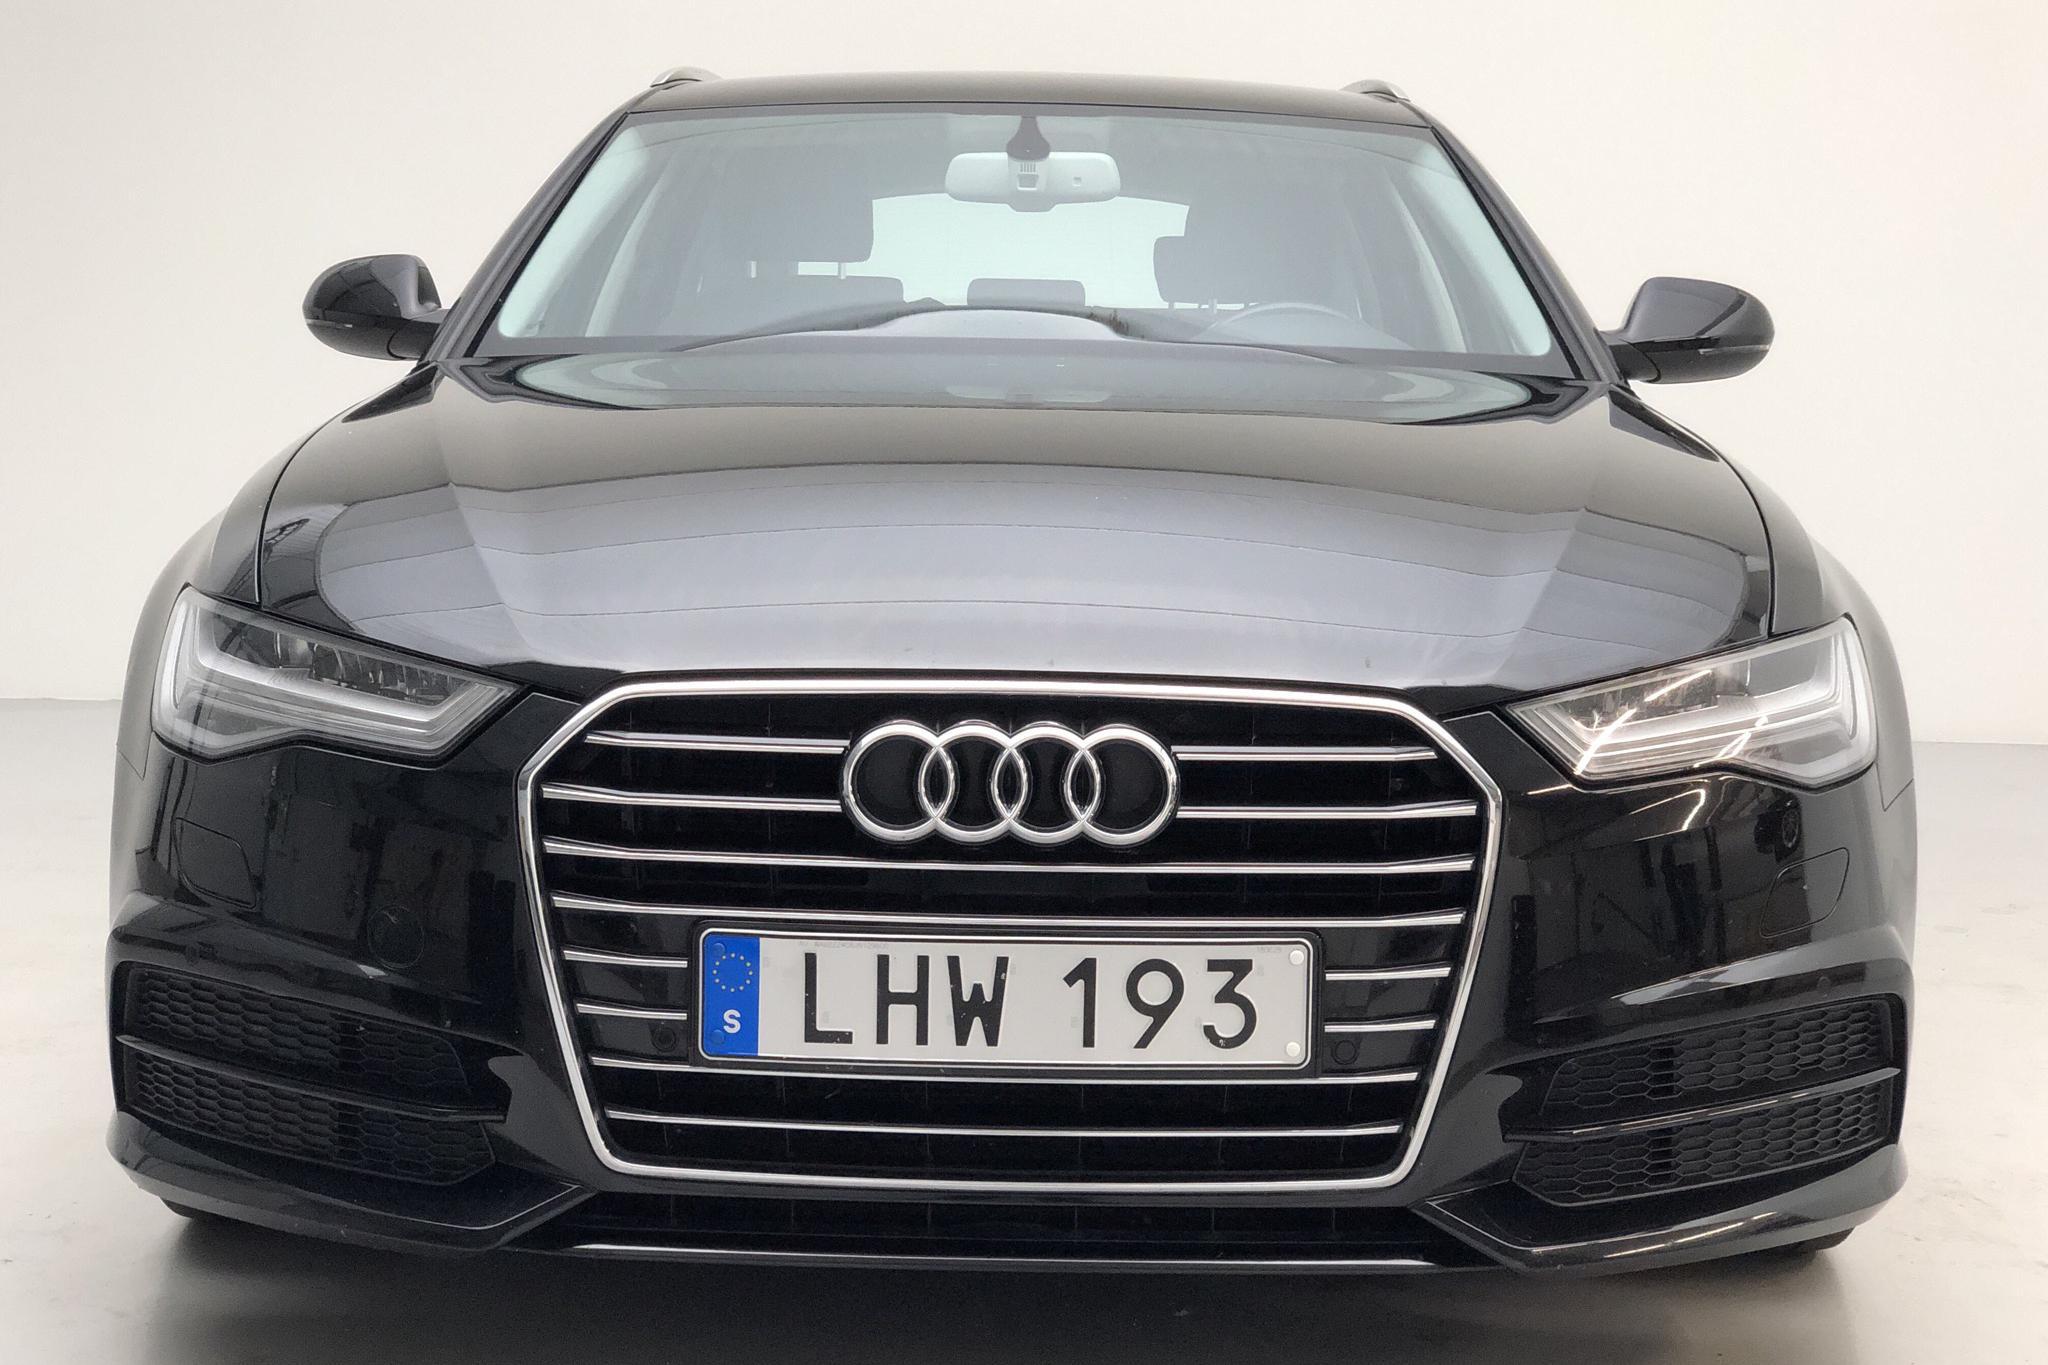 Audi A6 2.0 TDI Avant (190hk) - 96 890 km - Automatic - black - 2018